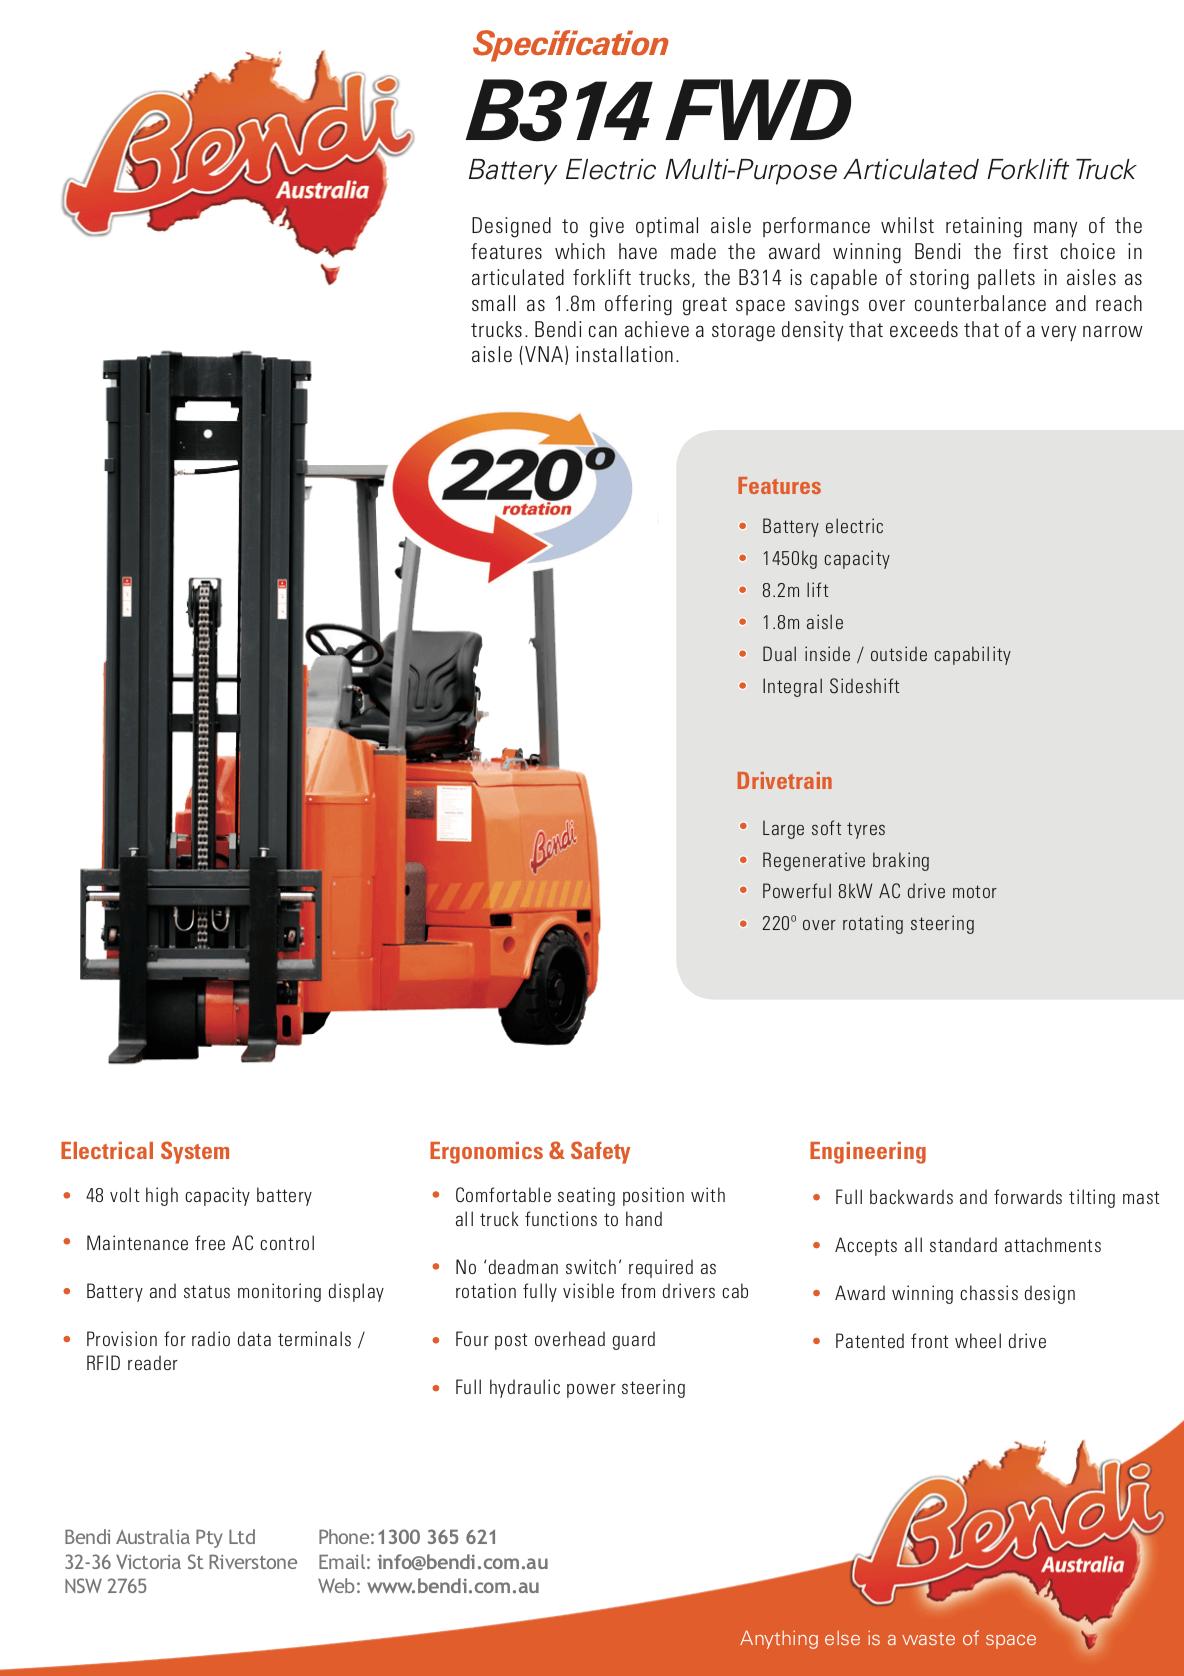 B314 FWD Forklift